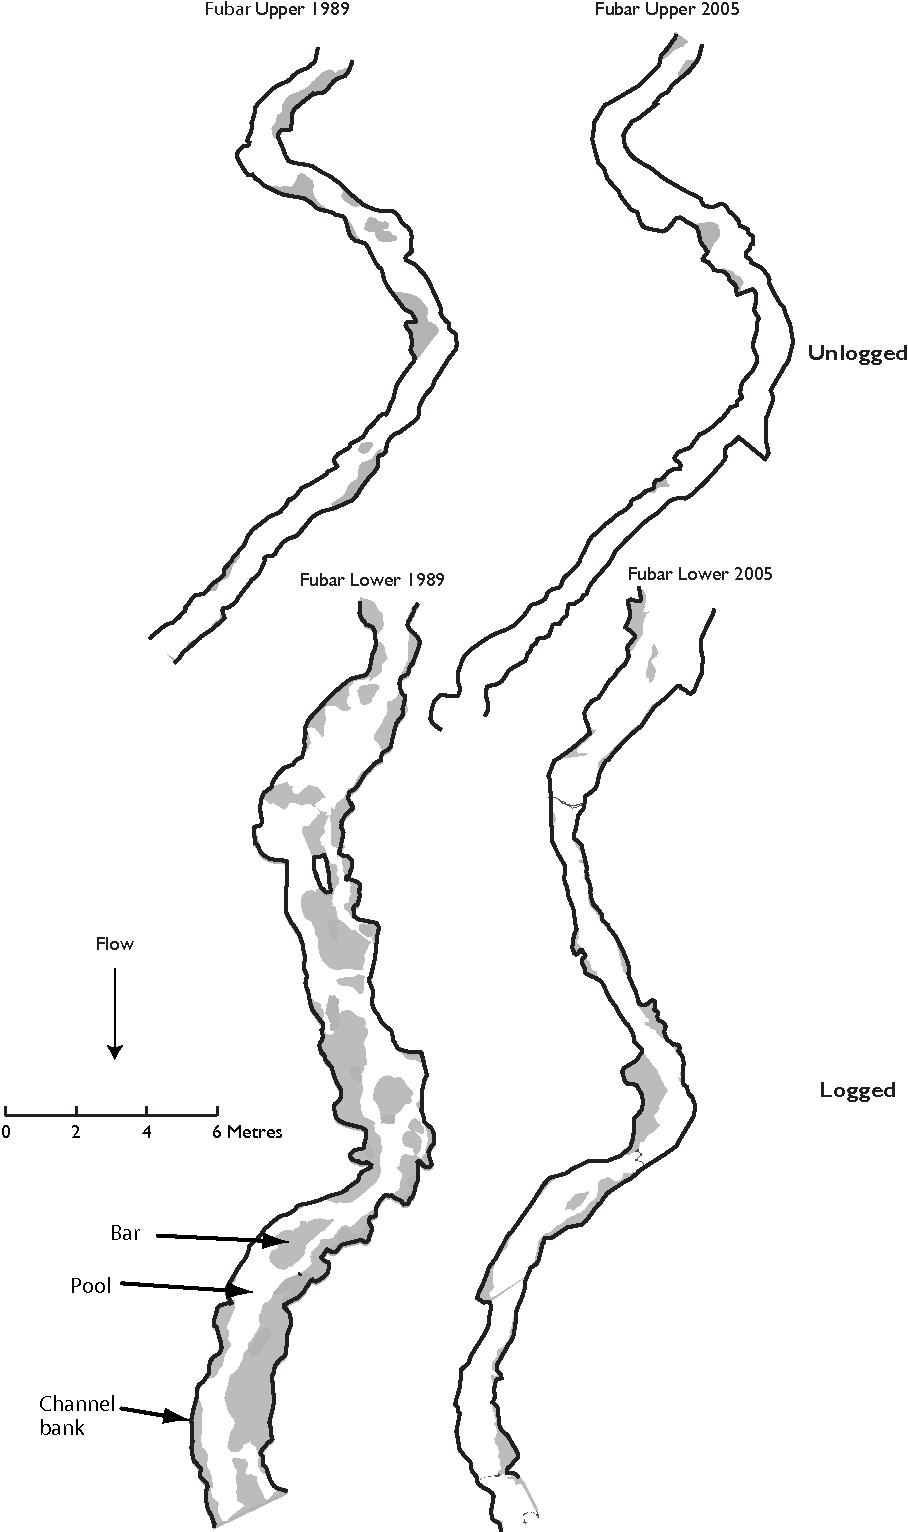 figure 10.26